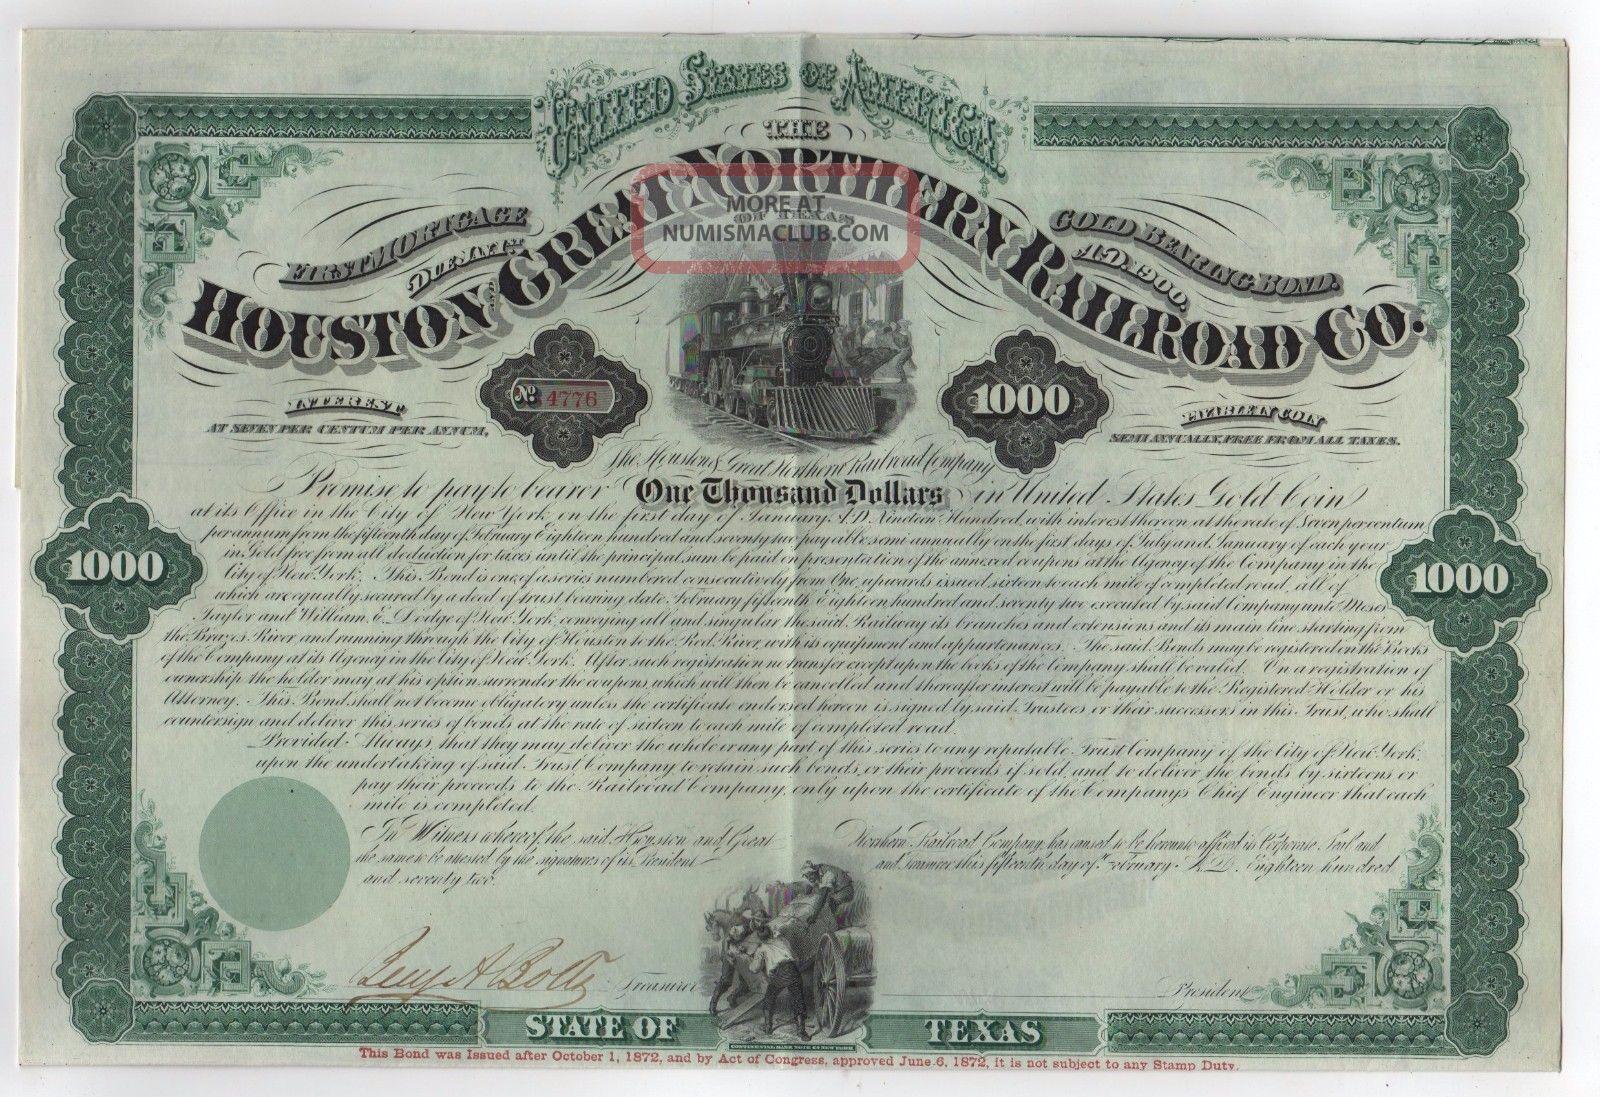 1872 Houston And Great Northern Railroad Company Bond Transportation photo